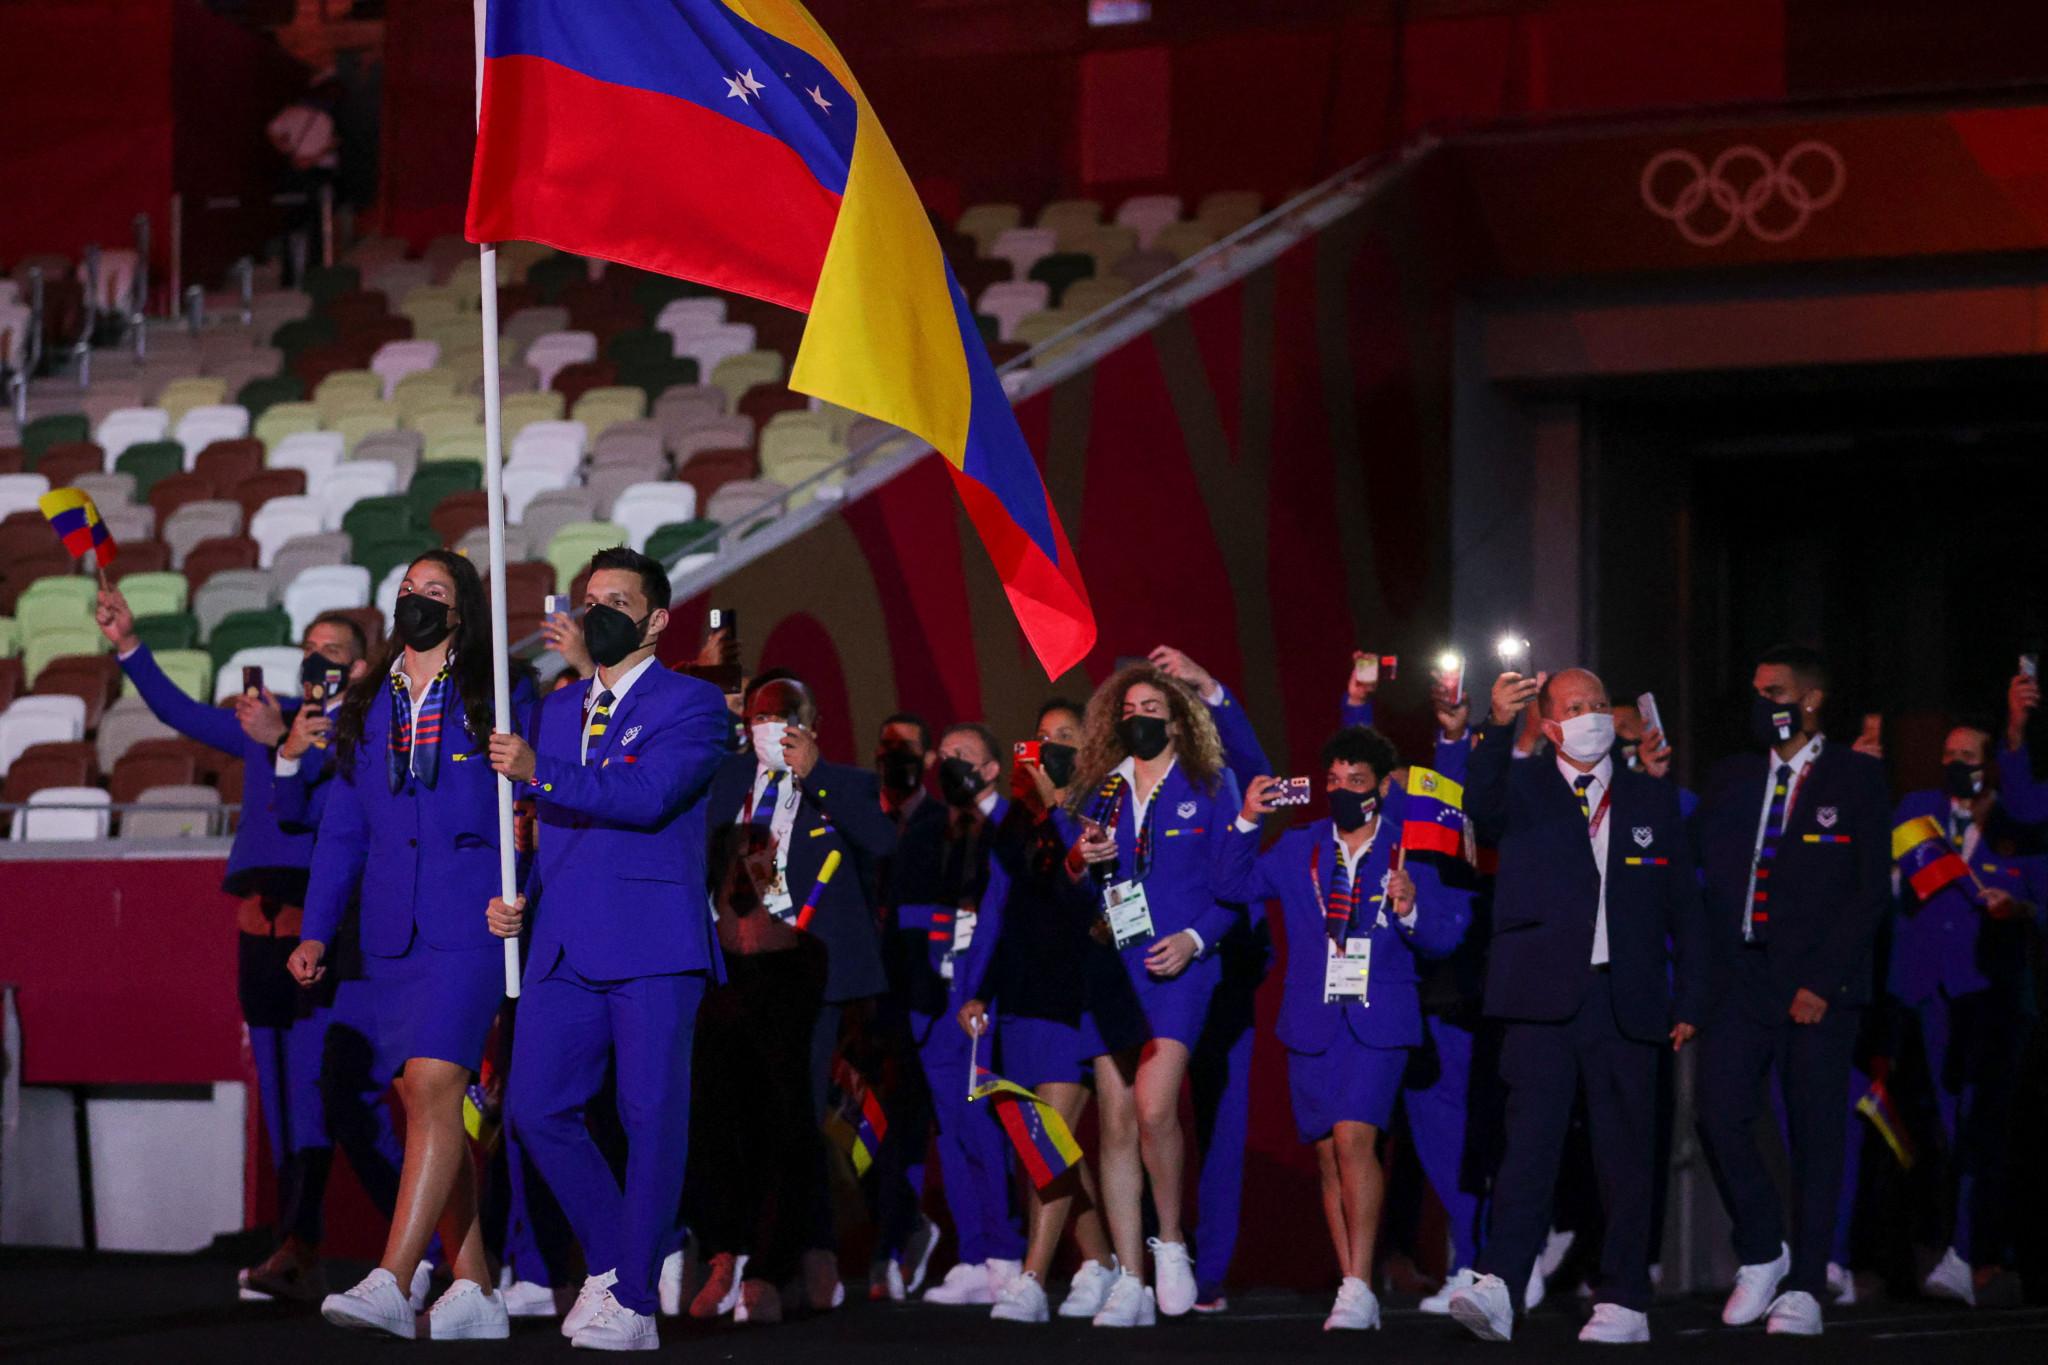 Karate star Antonio Diaz bears flag for Venezuela at Opening Ceremony